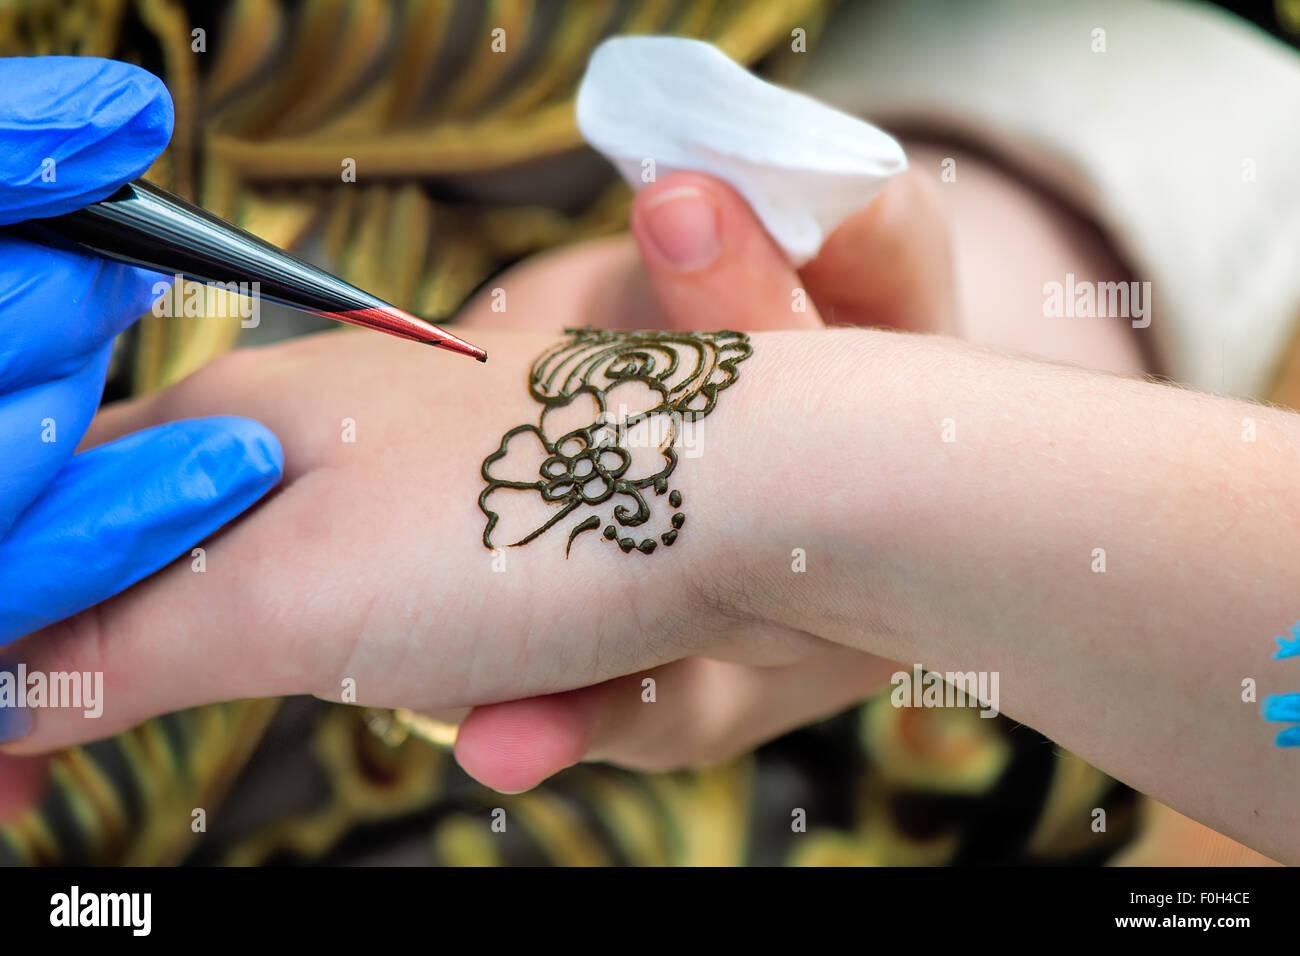 Herramienta Para Tatuajes Tatuajes De Hacer Un Dibujo En El Dorso De